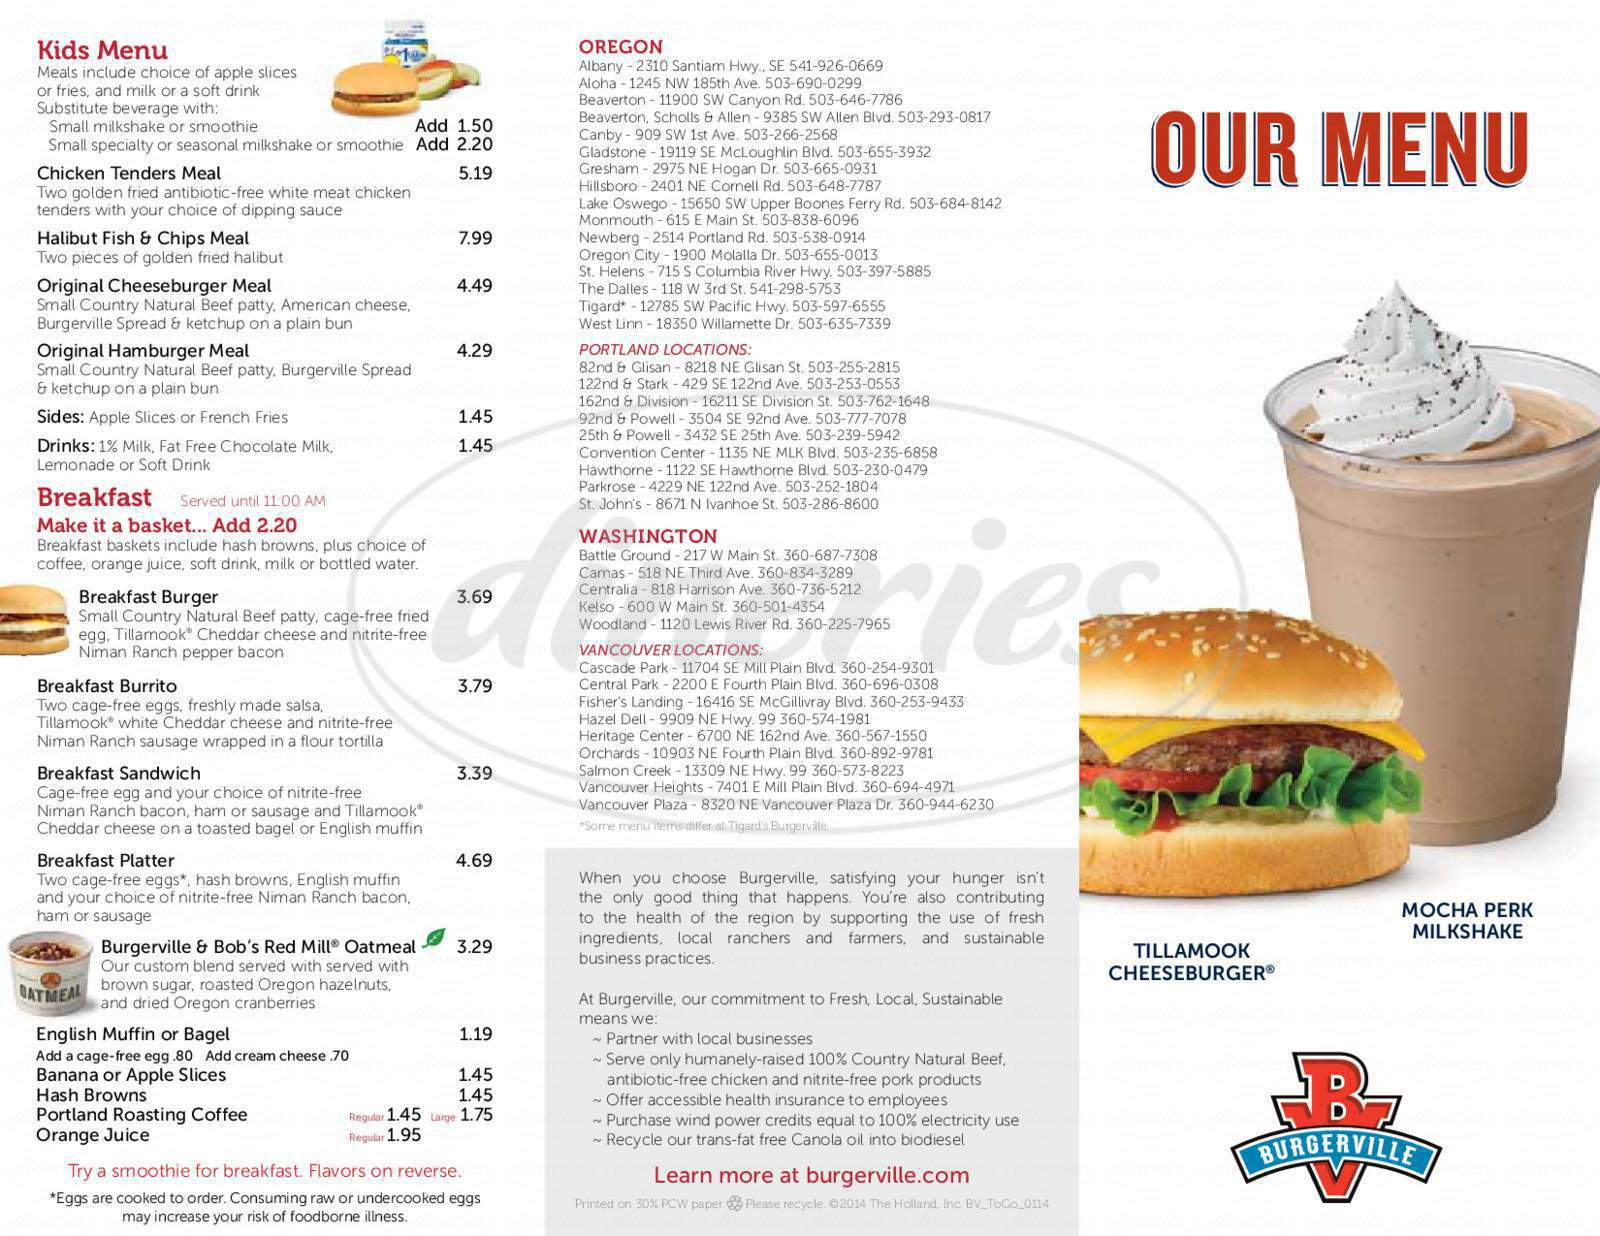 menu for Burgerville